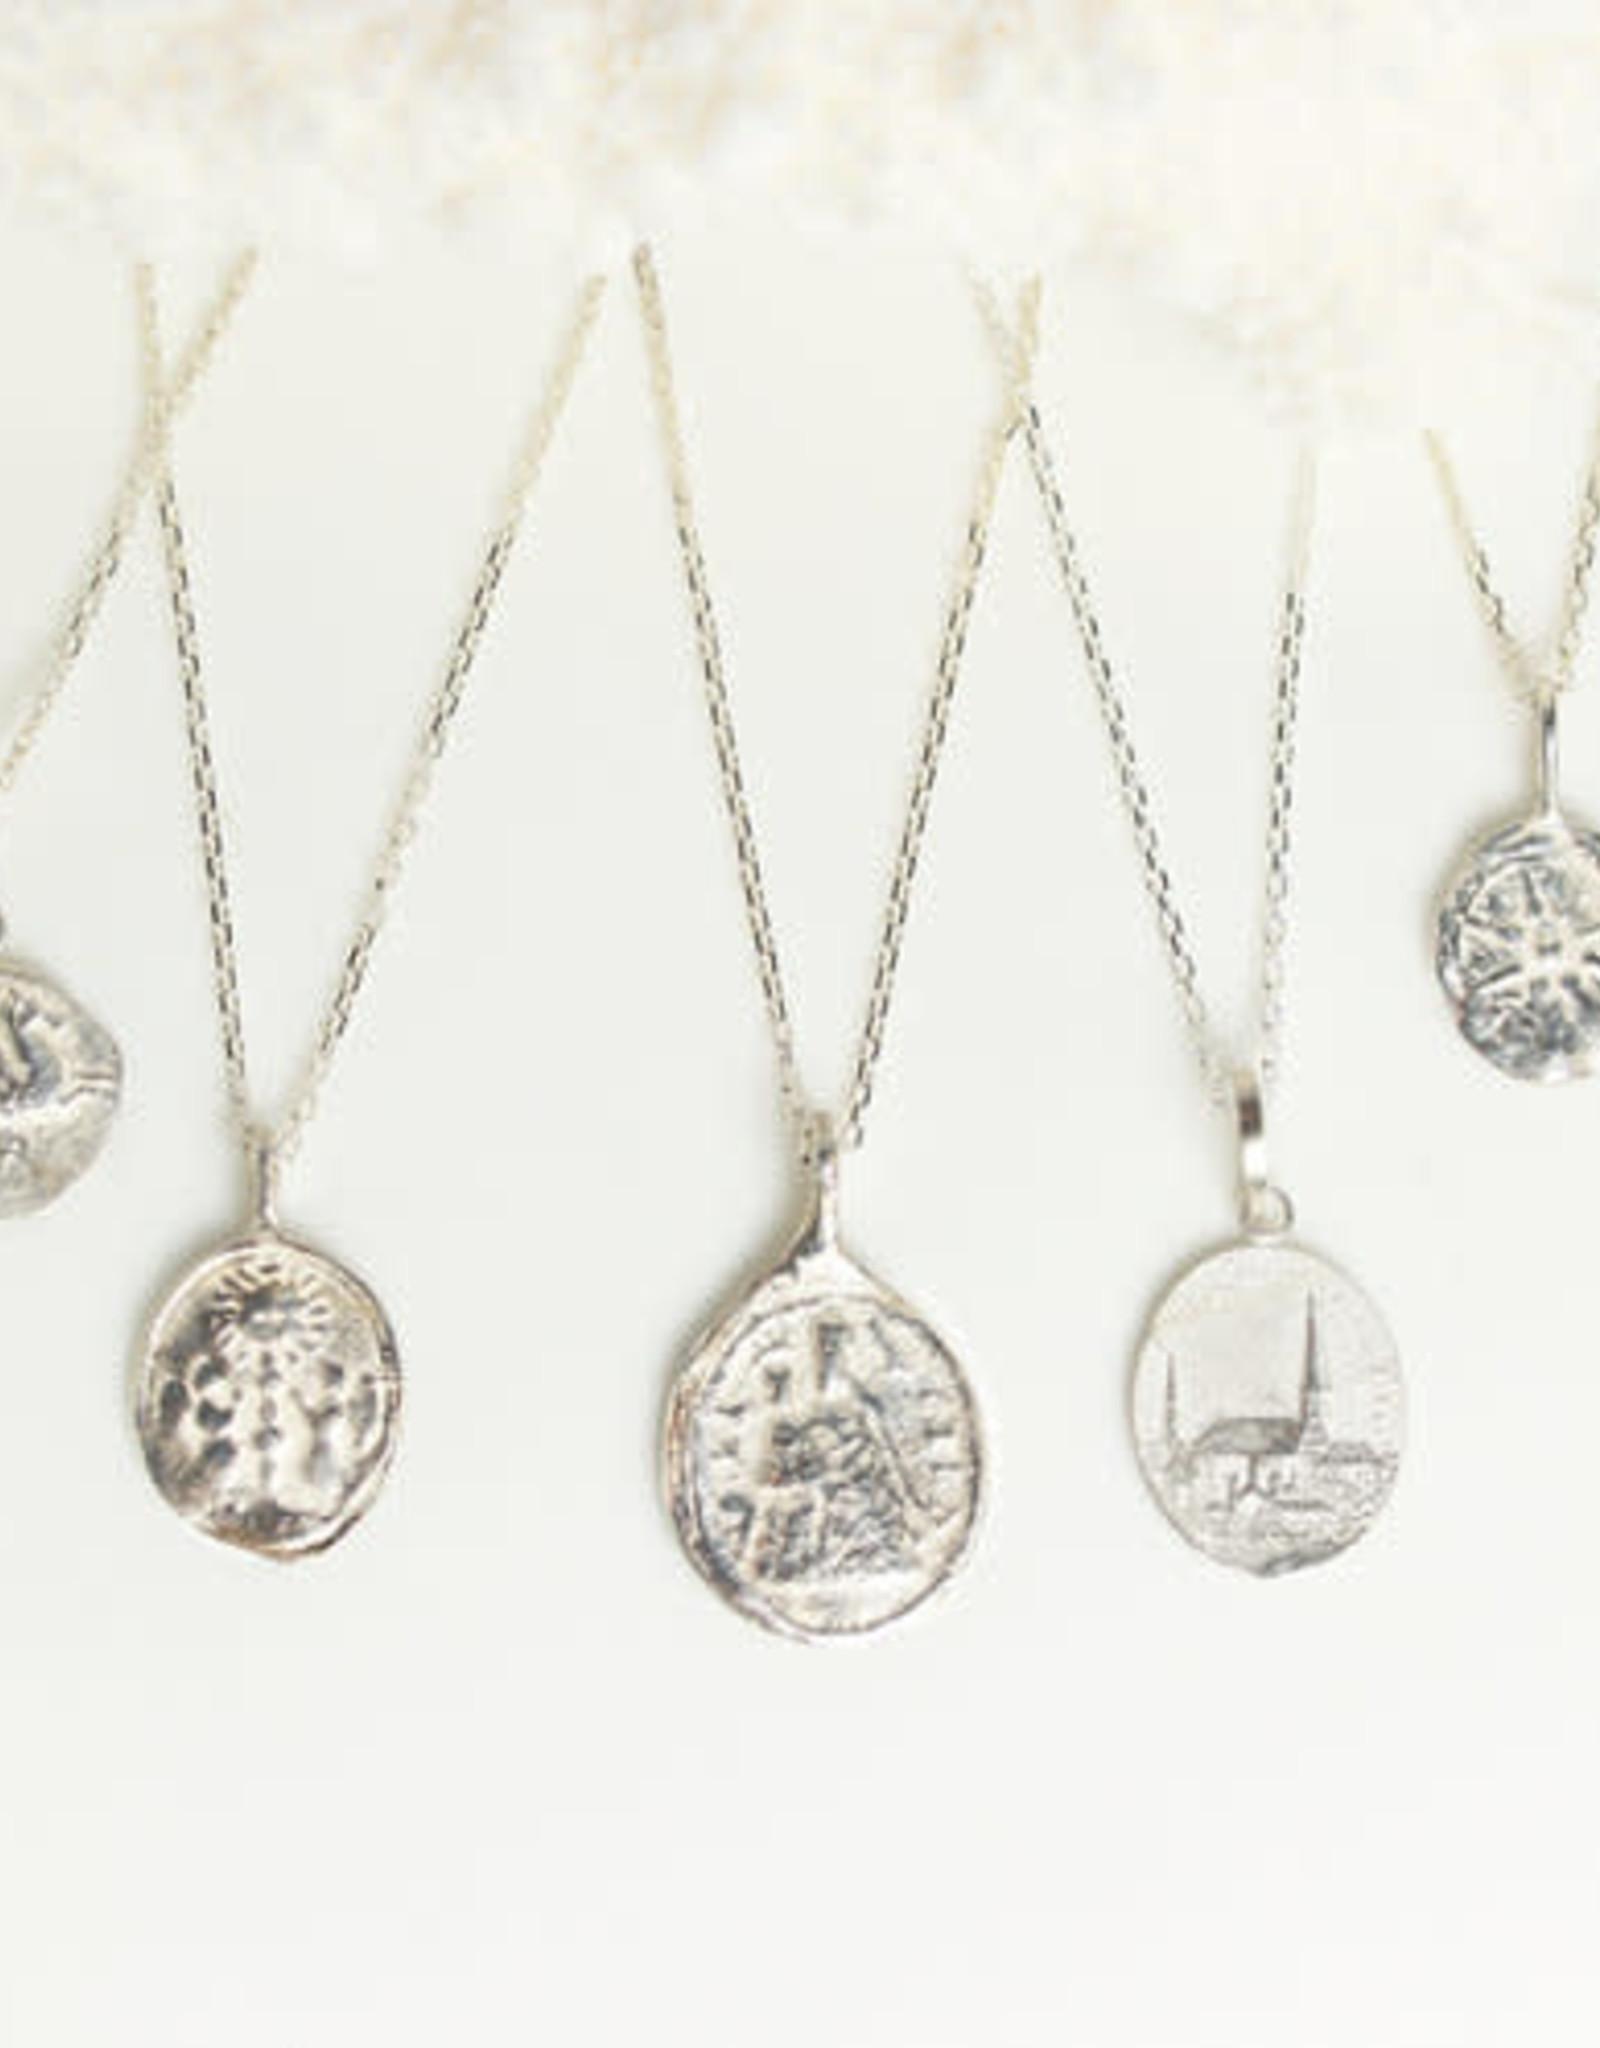 Robin Haley Jewelry The Horse (Beautiful Bond) Artifact Necklace